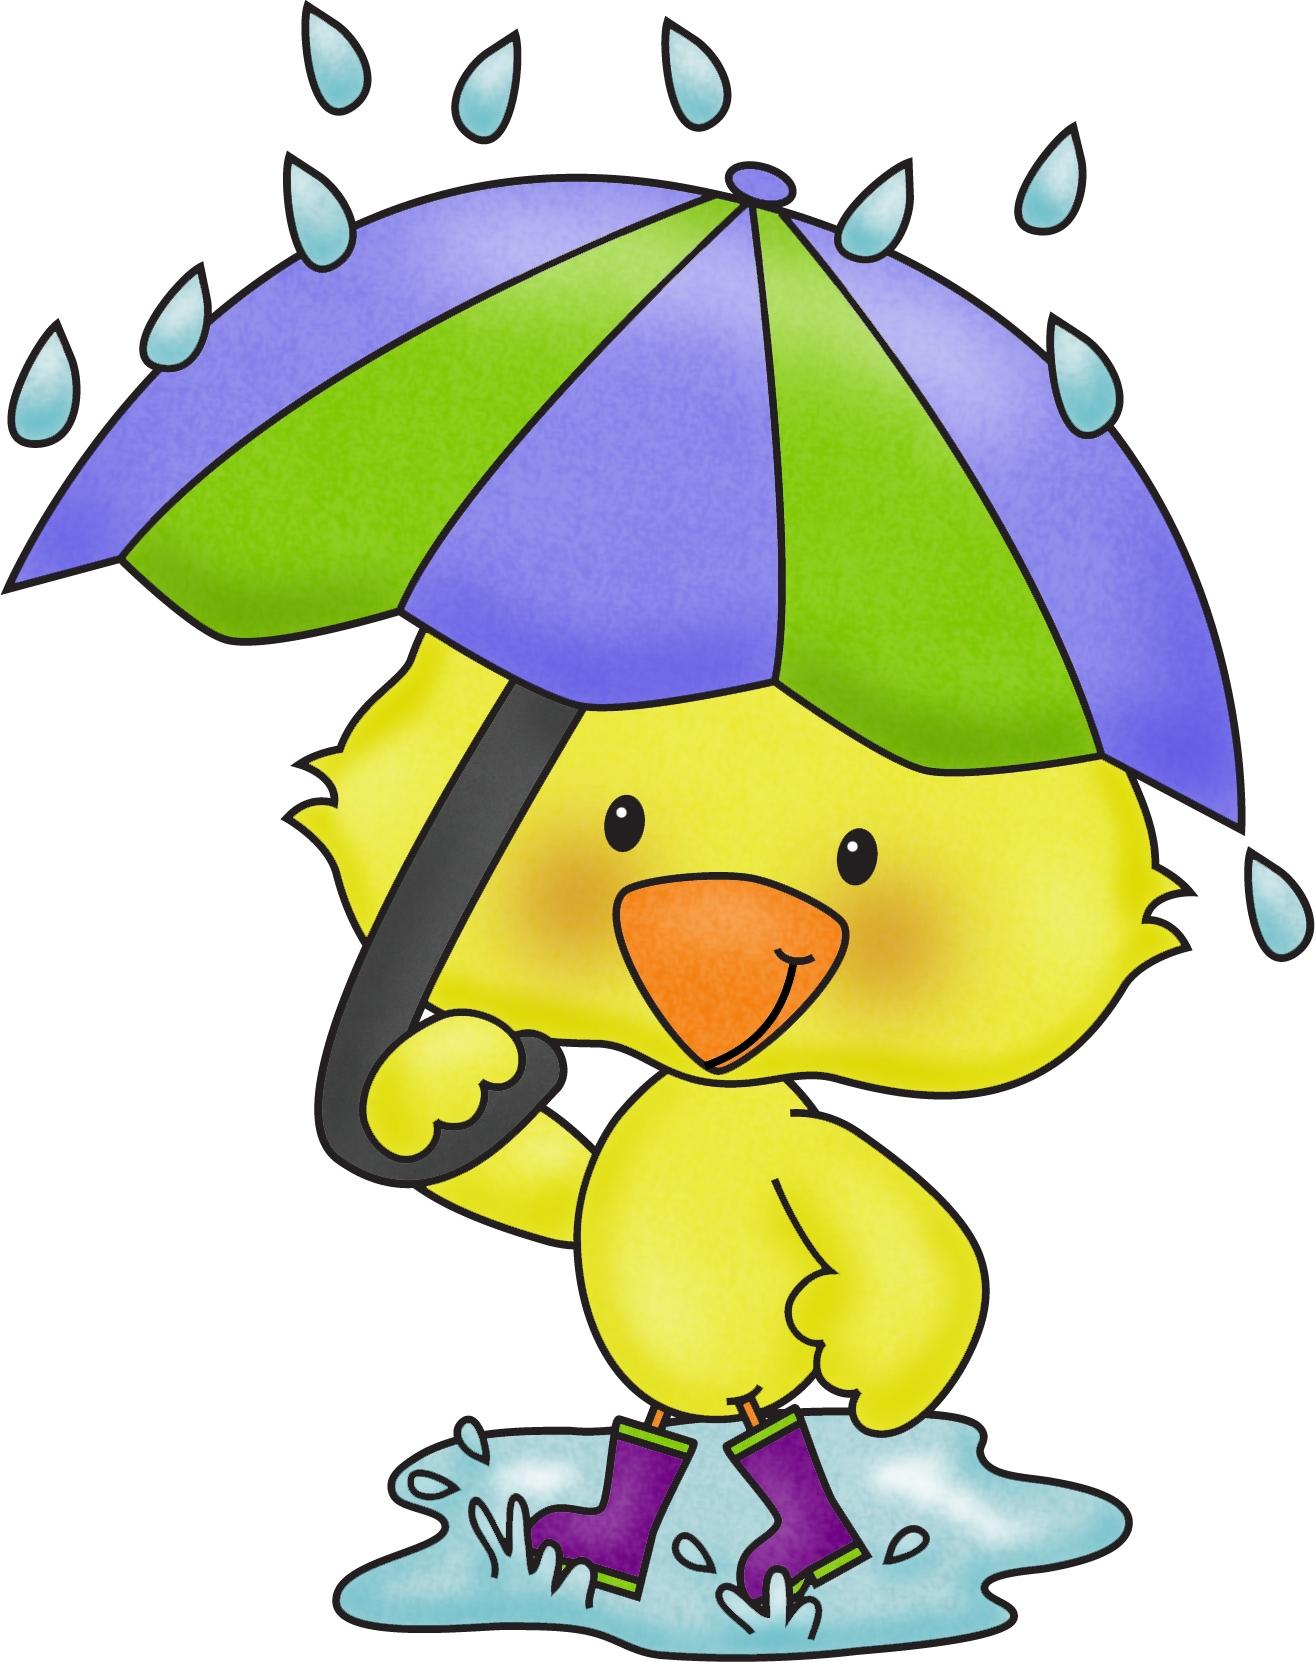 April clipart april shower. Iconoplaste com free and